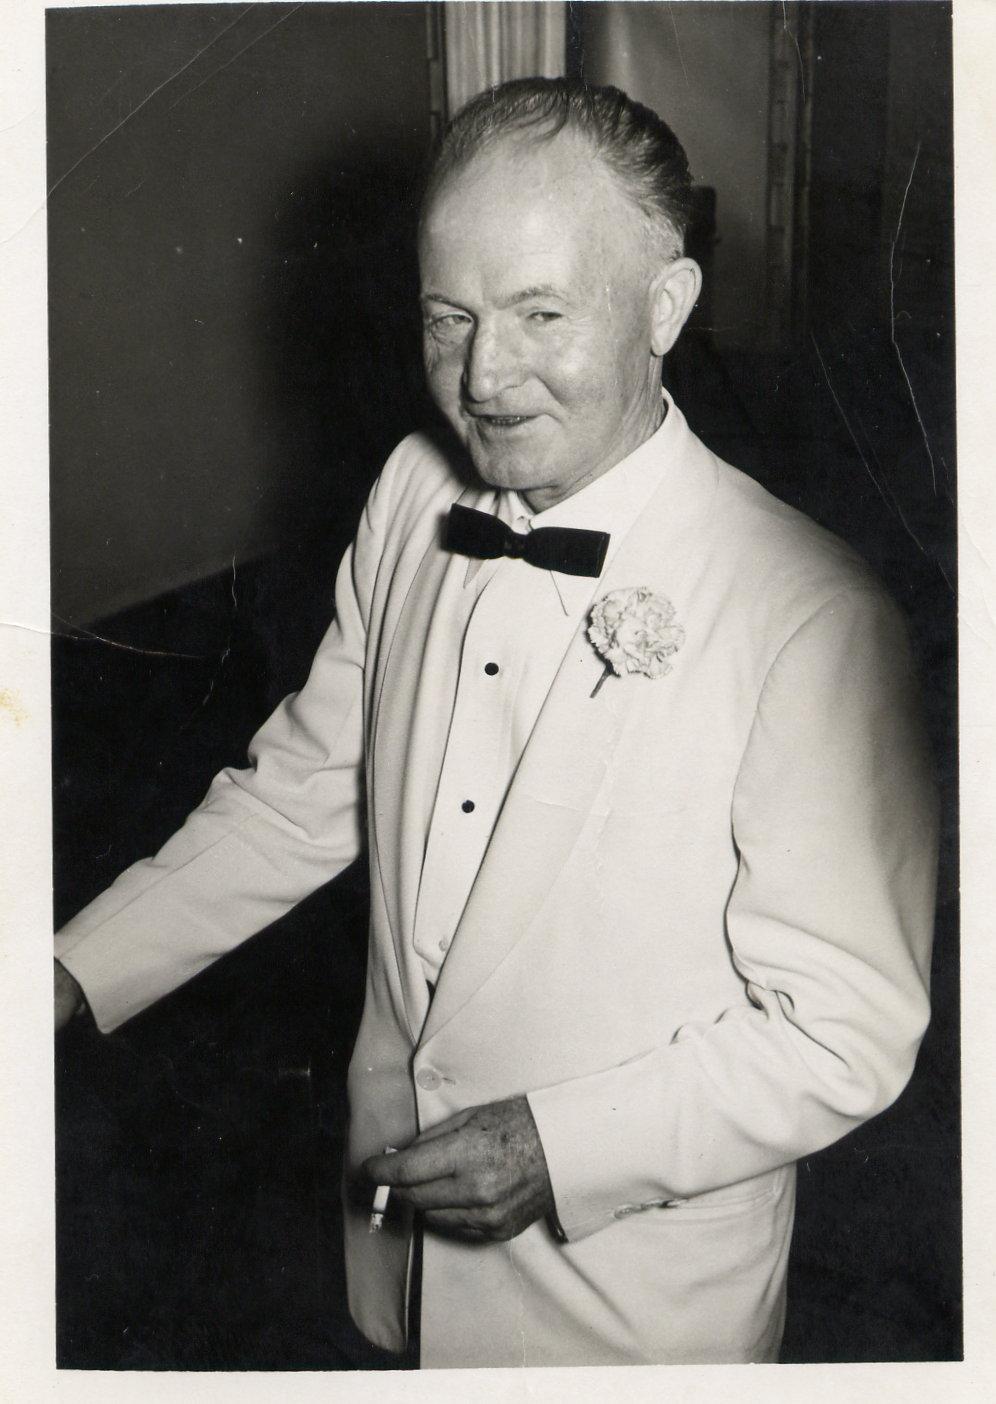 My maternal grandfather.